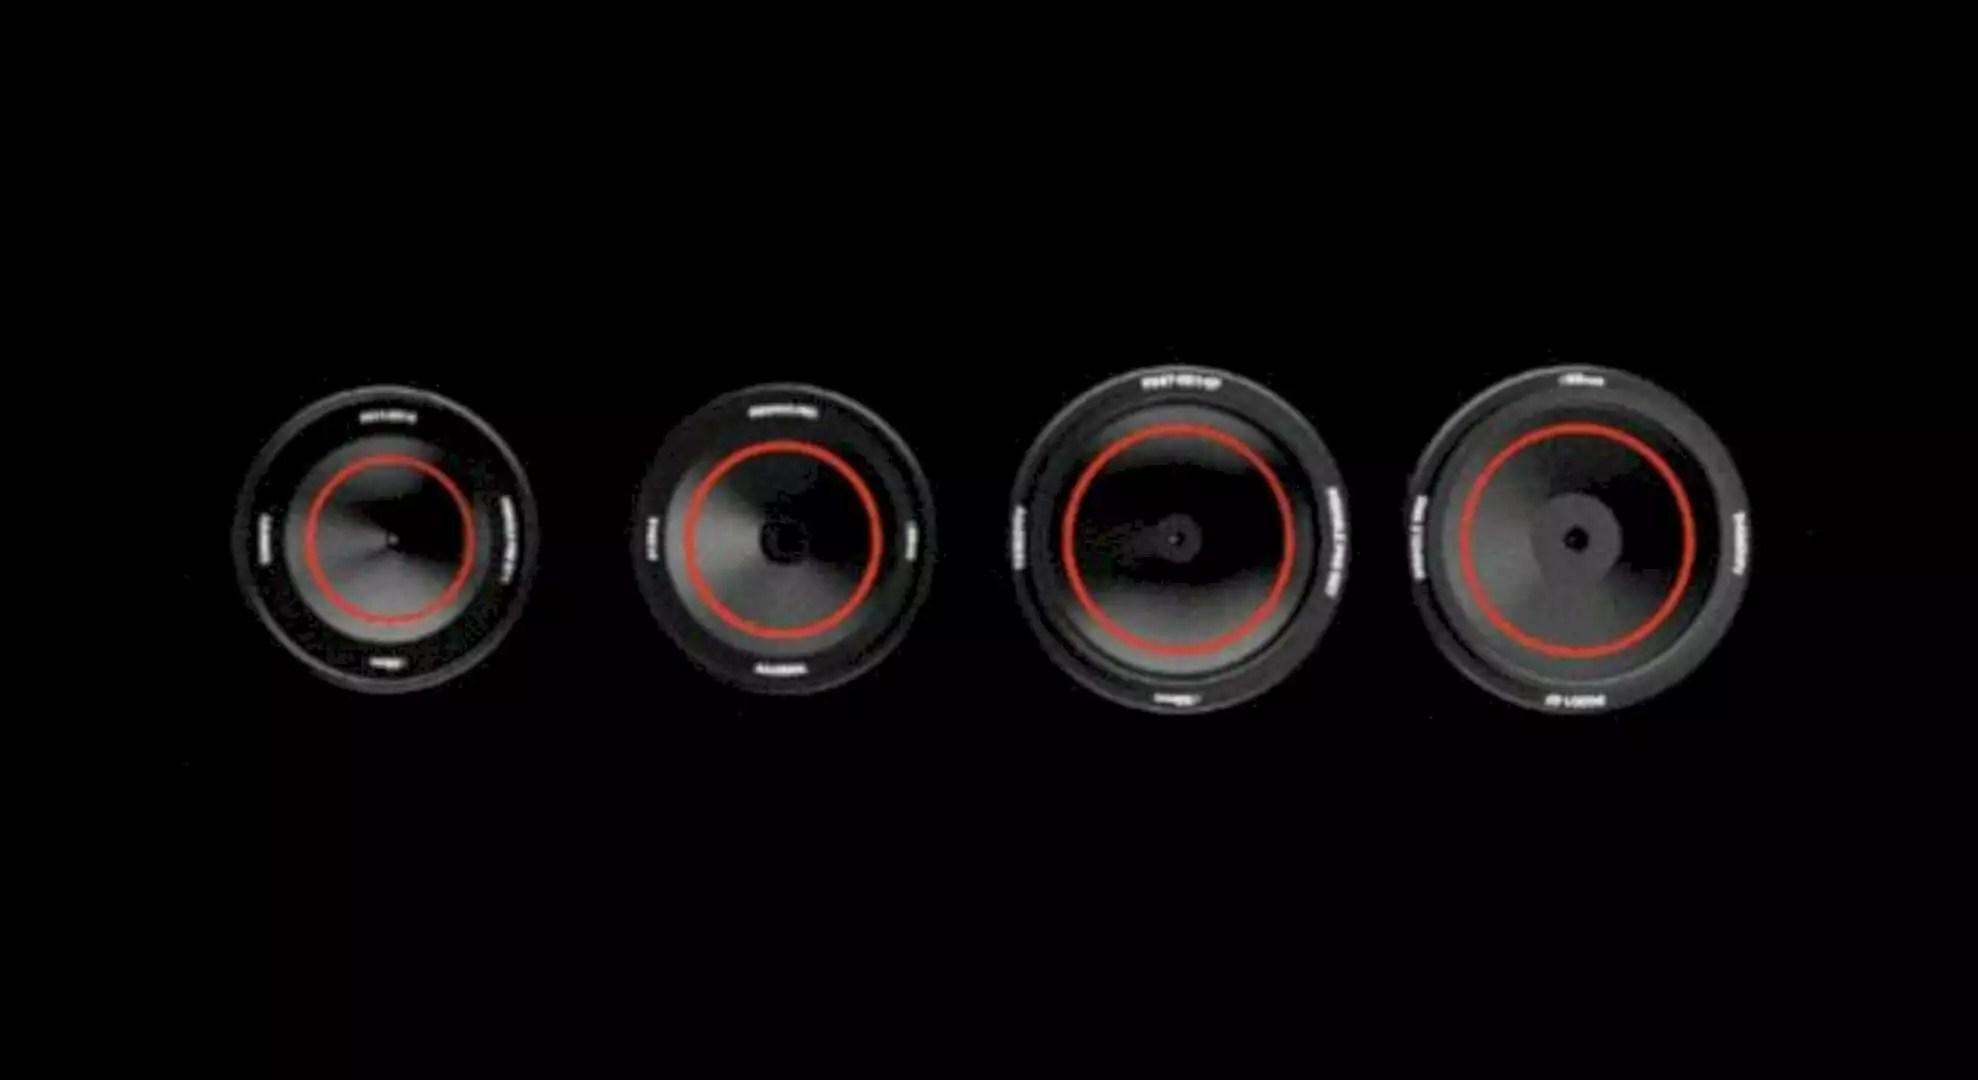 Pinhole Pro S: The Widest Professional Pinhole Lens for A Perfect Shot